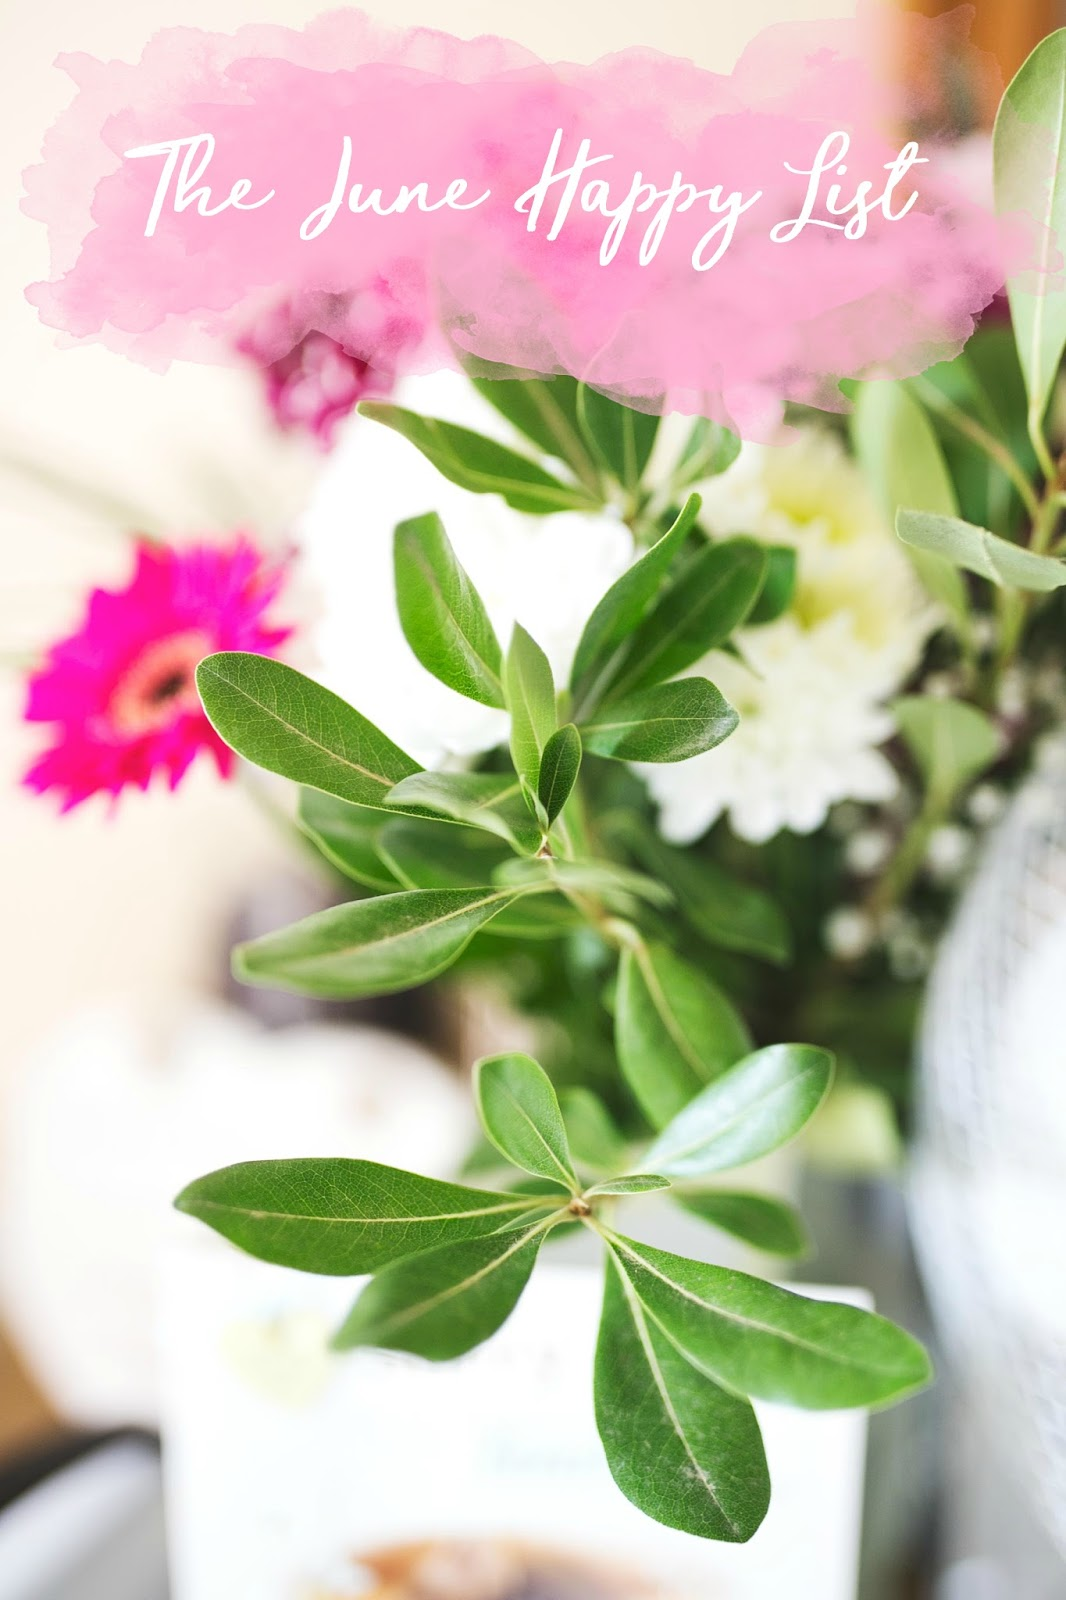 Flowers, Watercolour, Text Overlay, Beauty Bloggers, Beauty Blogs, Lifestyle Bloggers, Lifestyle Blogs, Derbyshire Blogs, East Midlands Bloggers, Katie Writes, Katie Writes Blog,